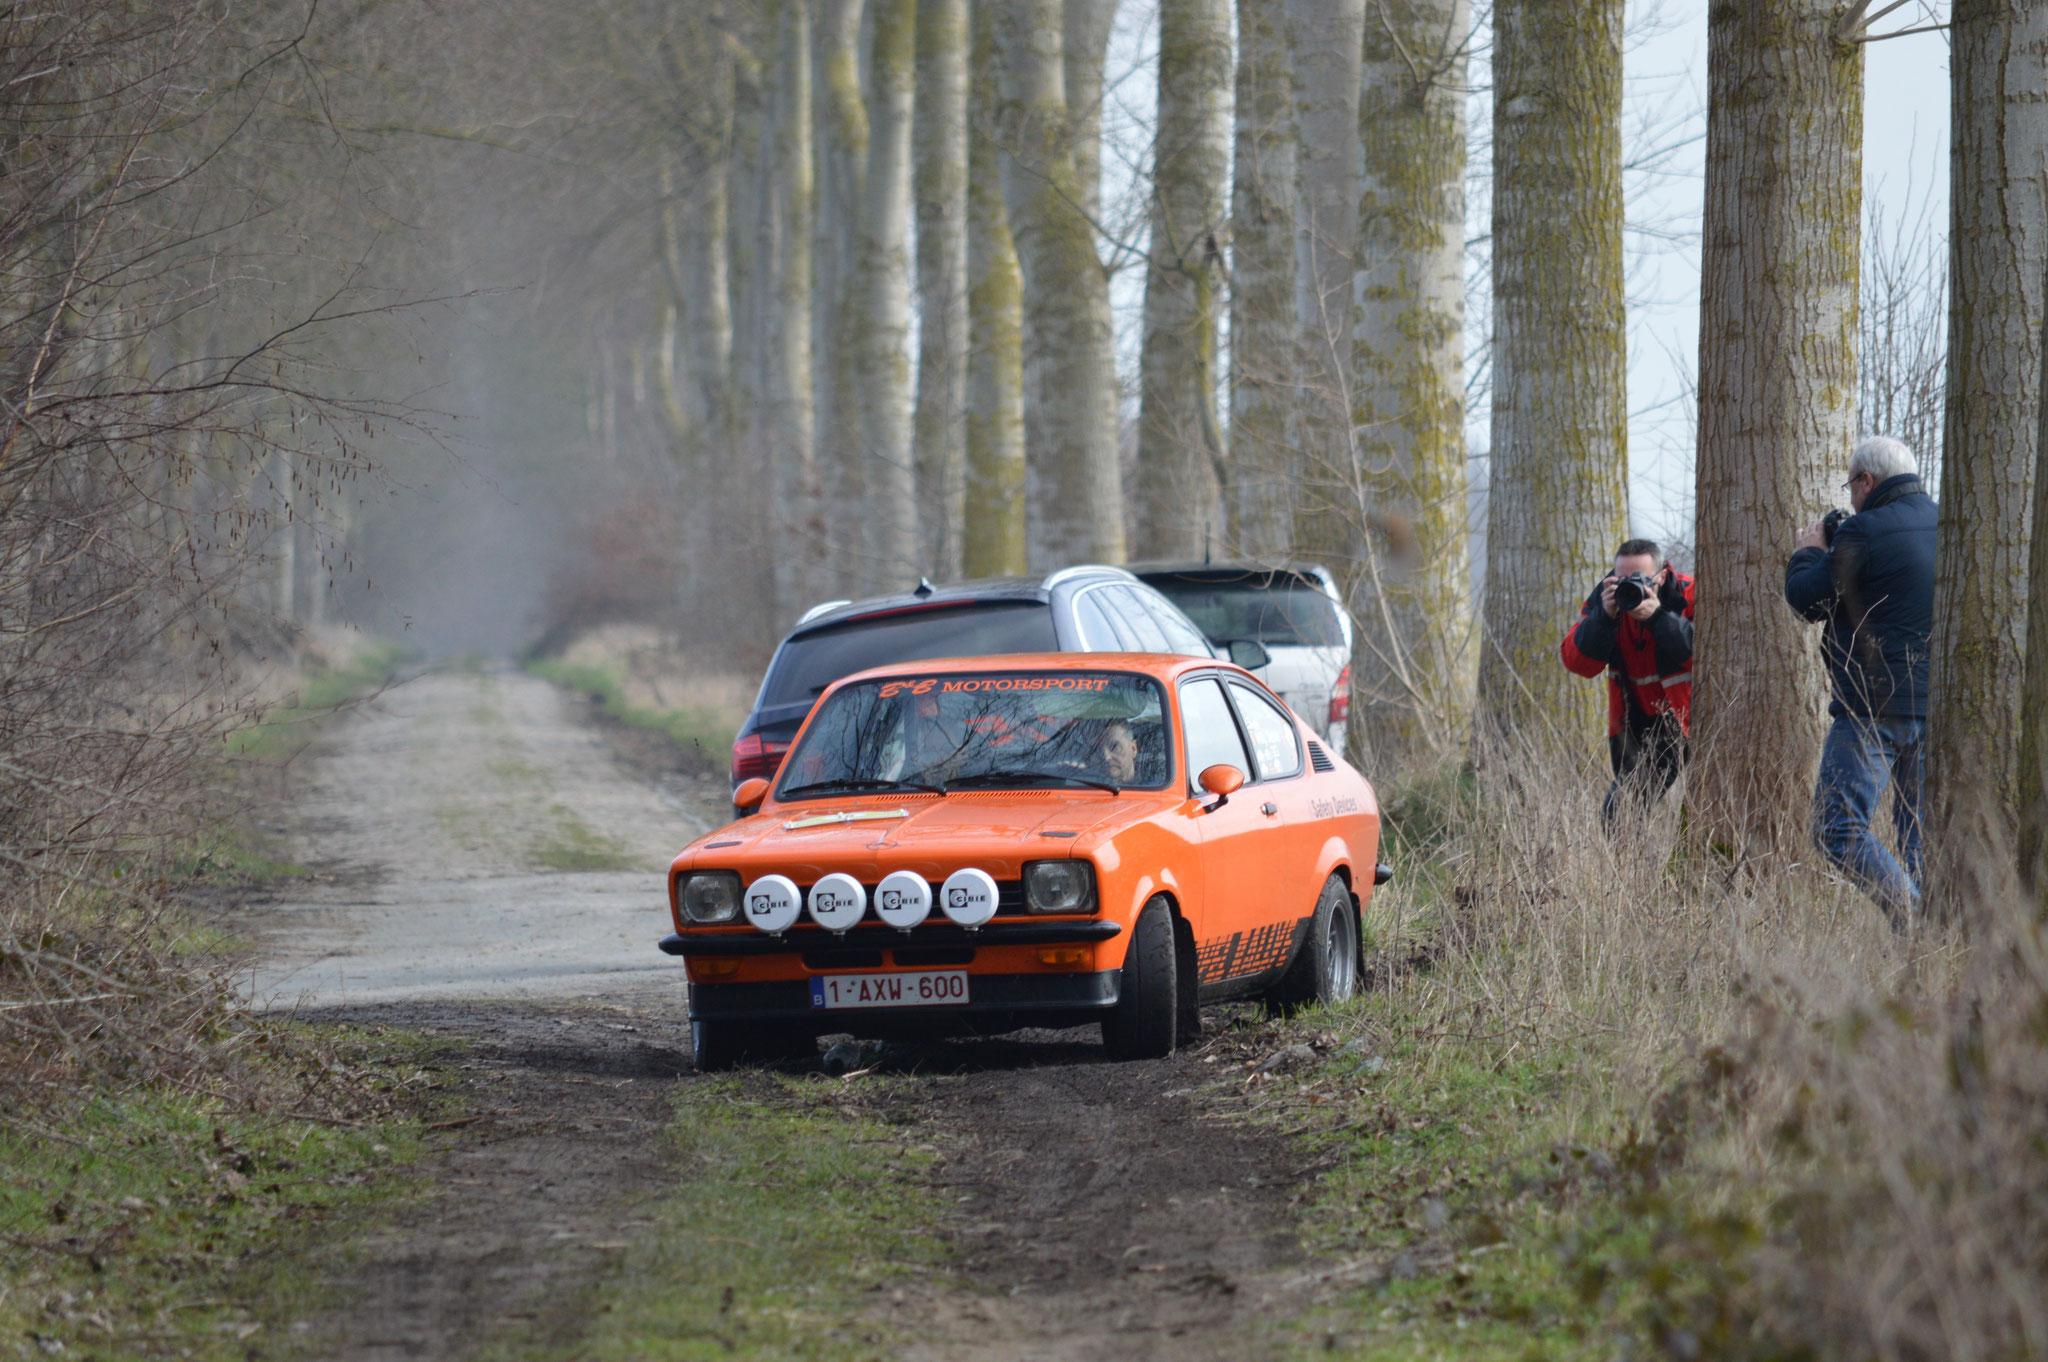 1005 - Opel - Kadett C - 1976